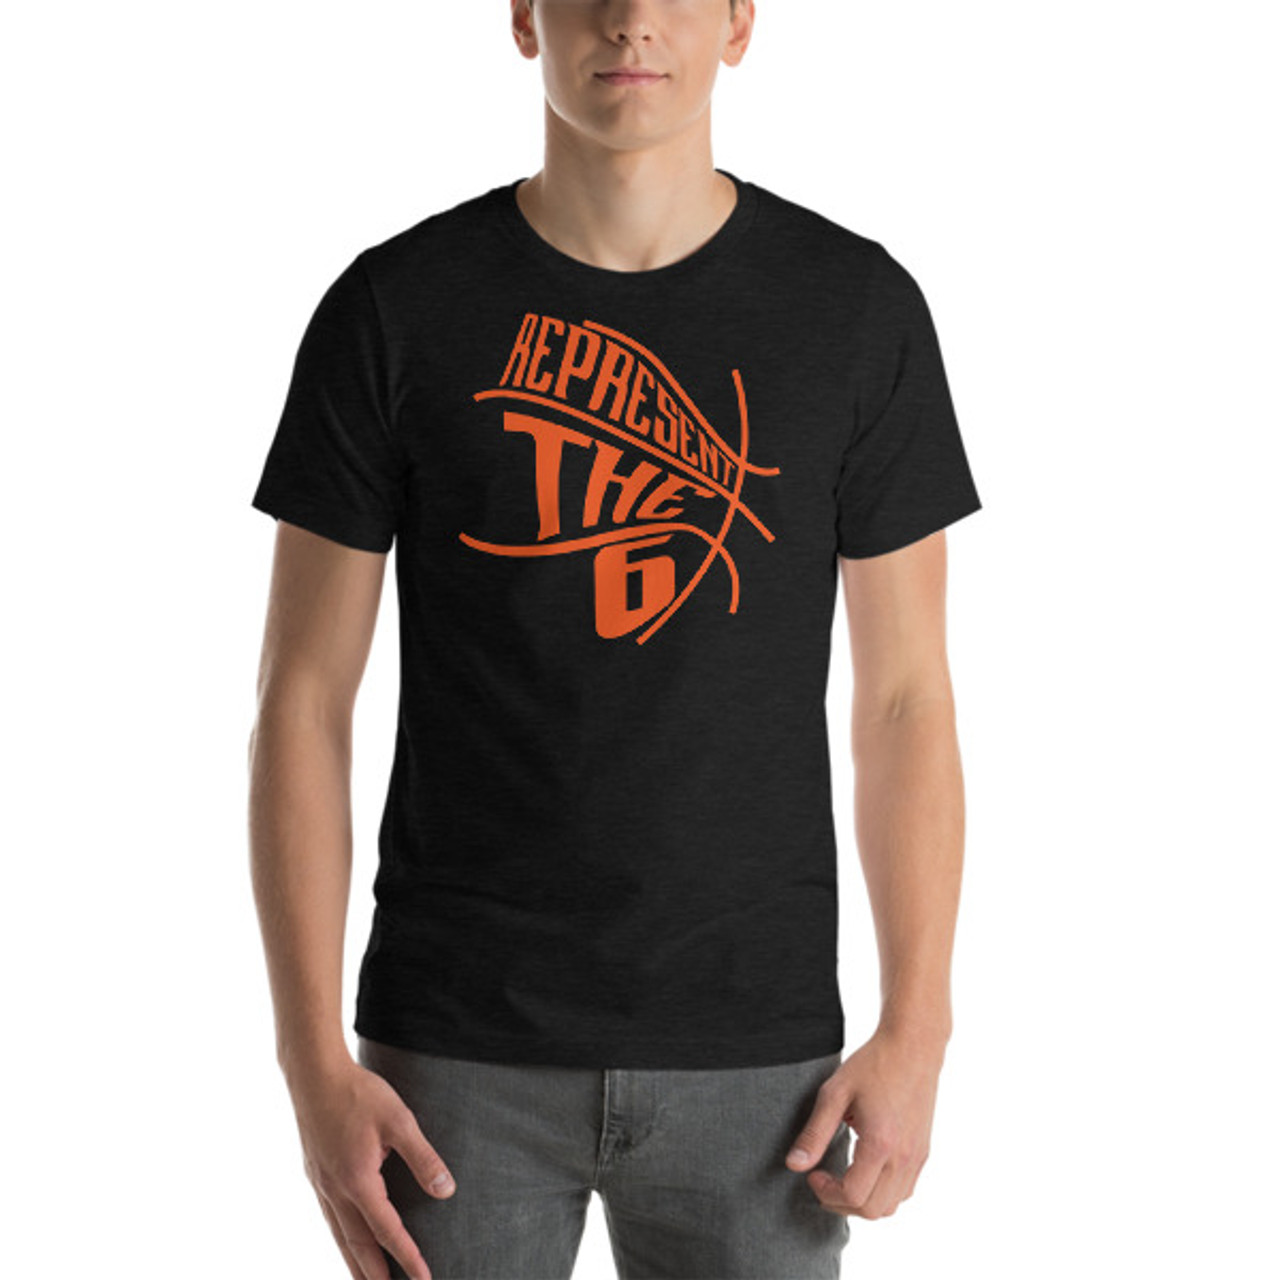 CHAMPS Basketball Team Represent The 6 T-Shirt